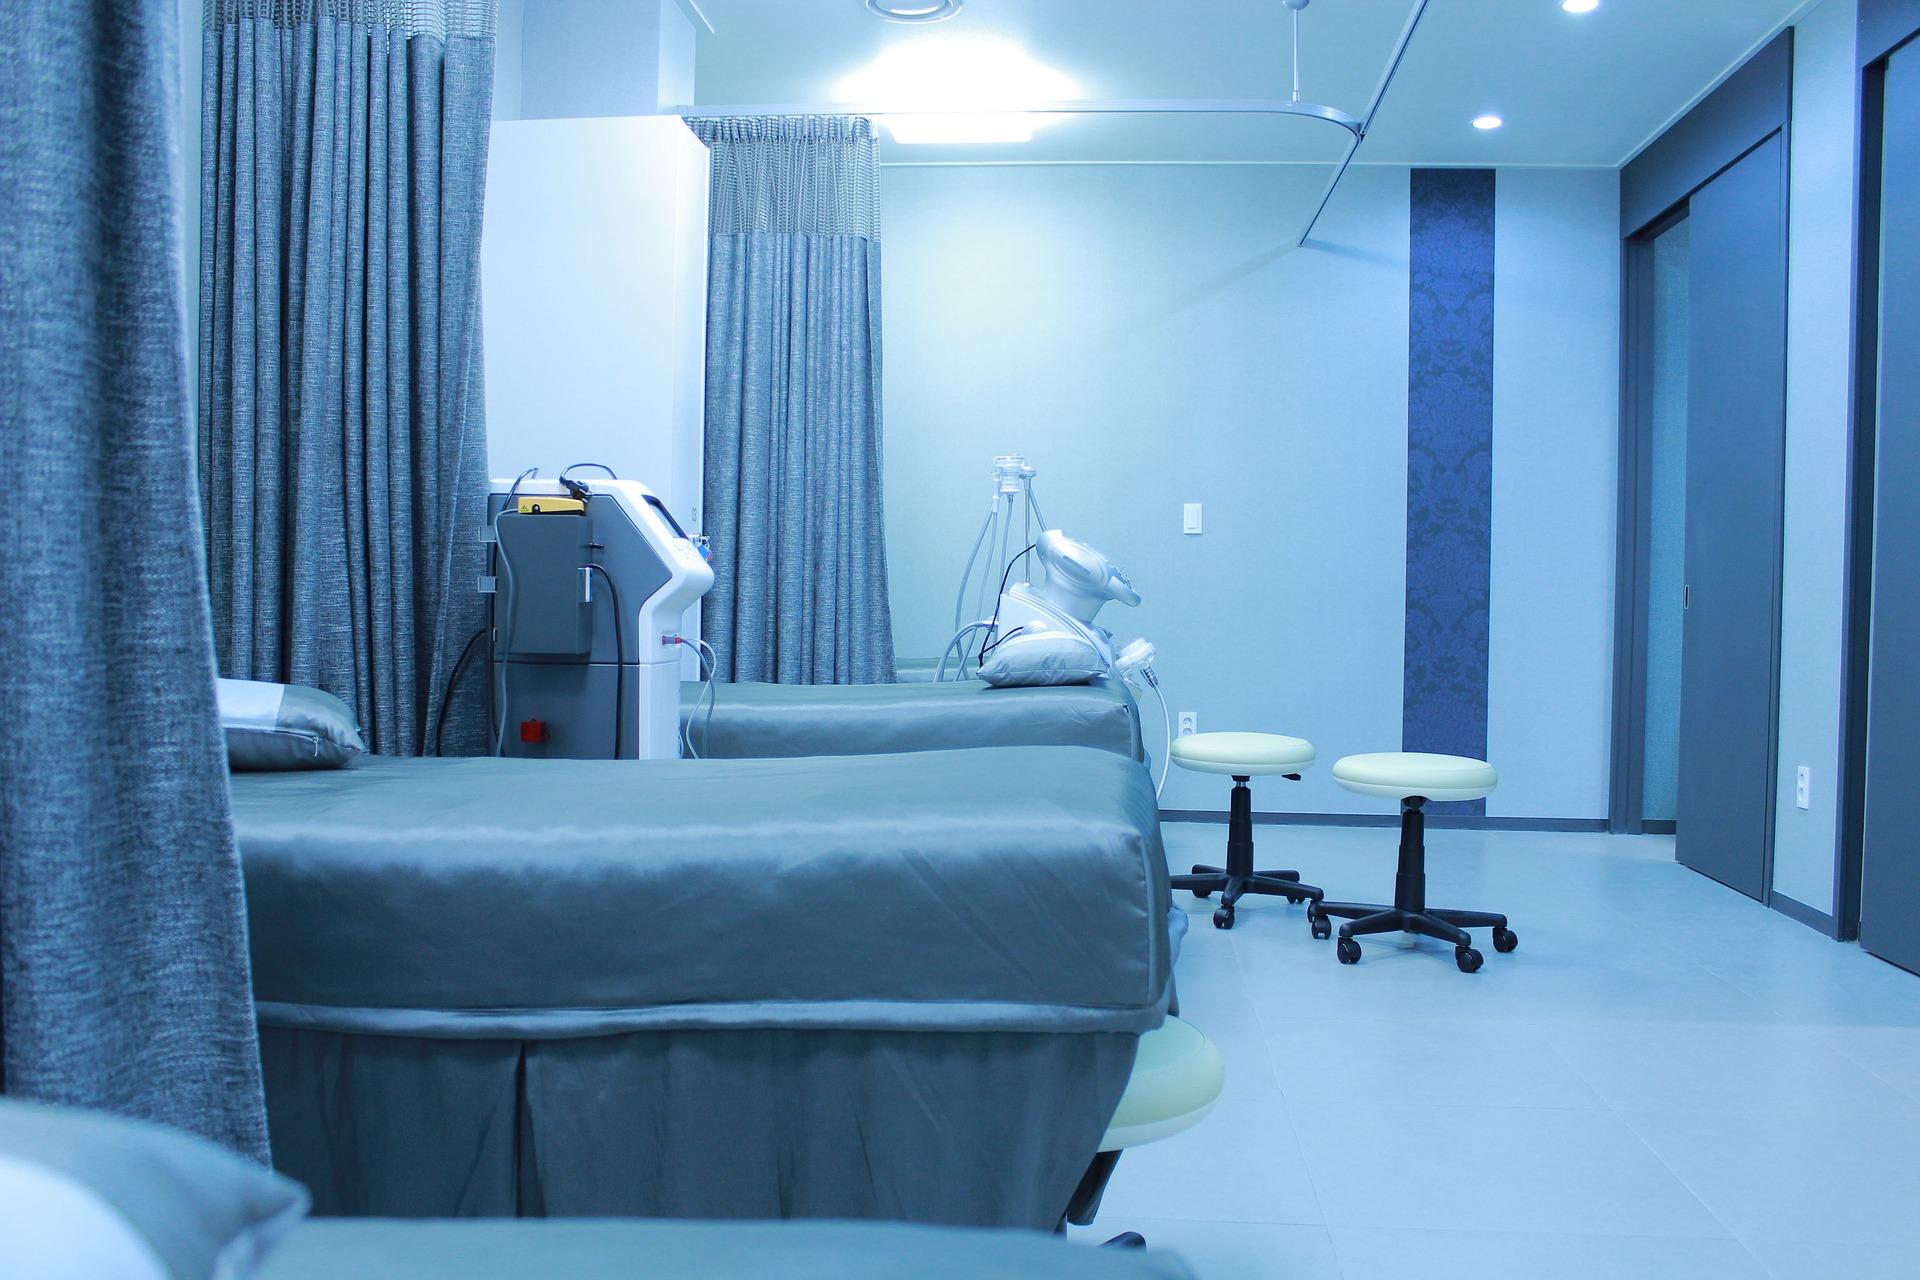 hospital-ward-1338584_1920